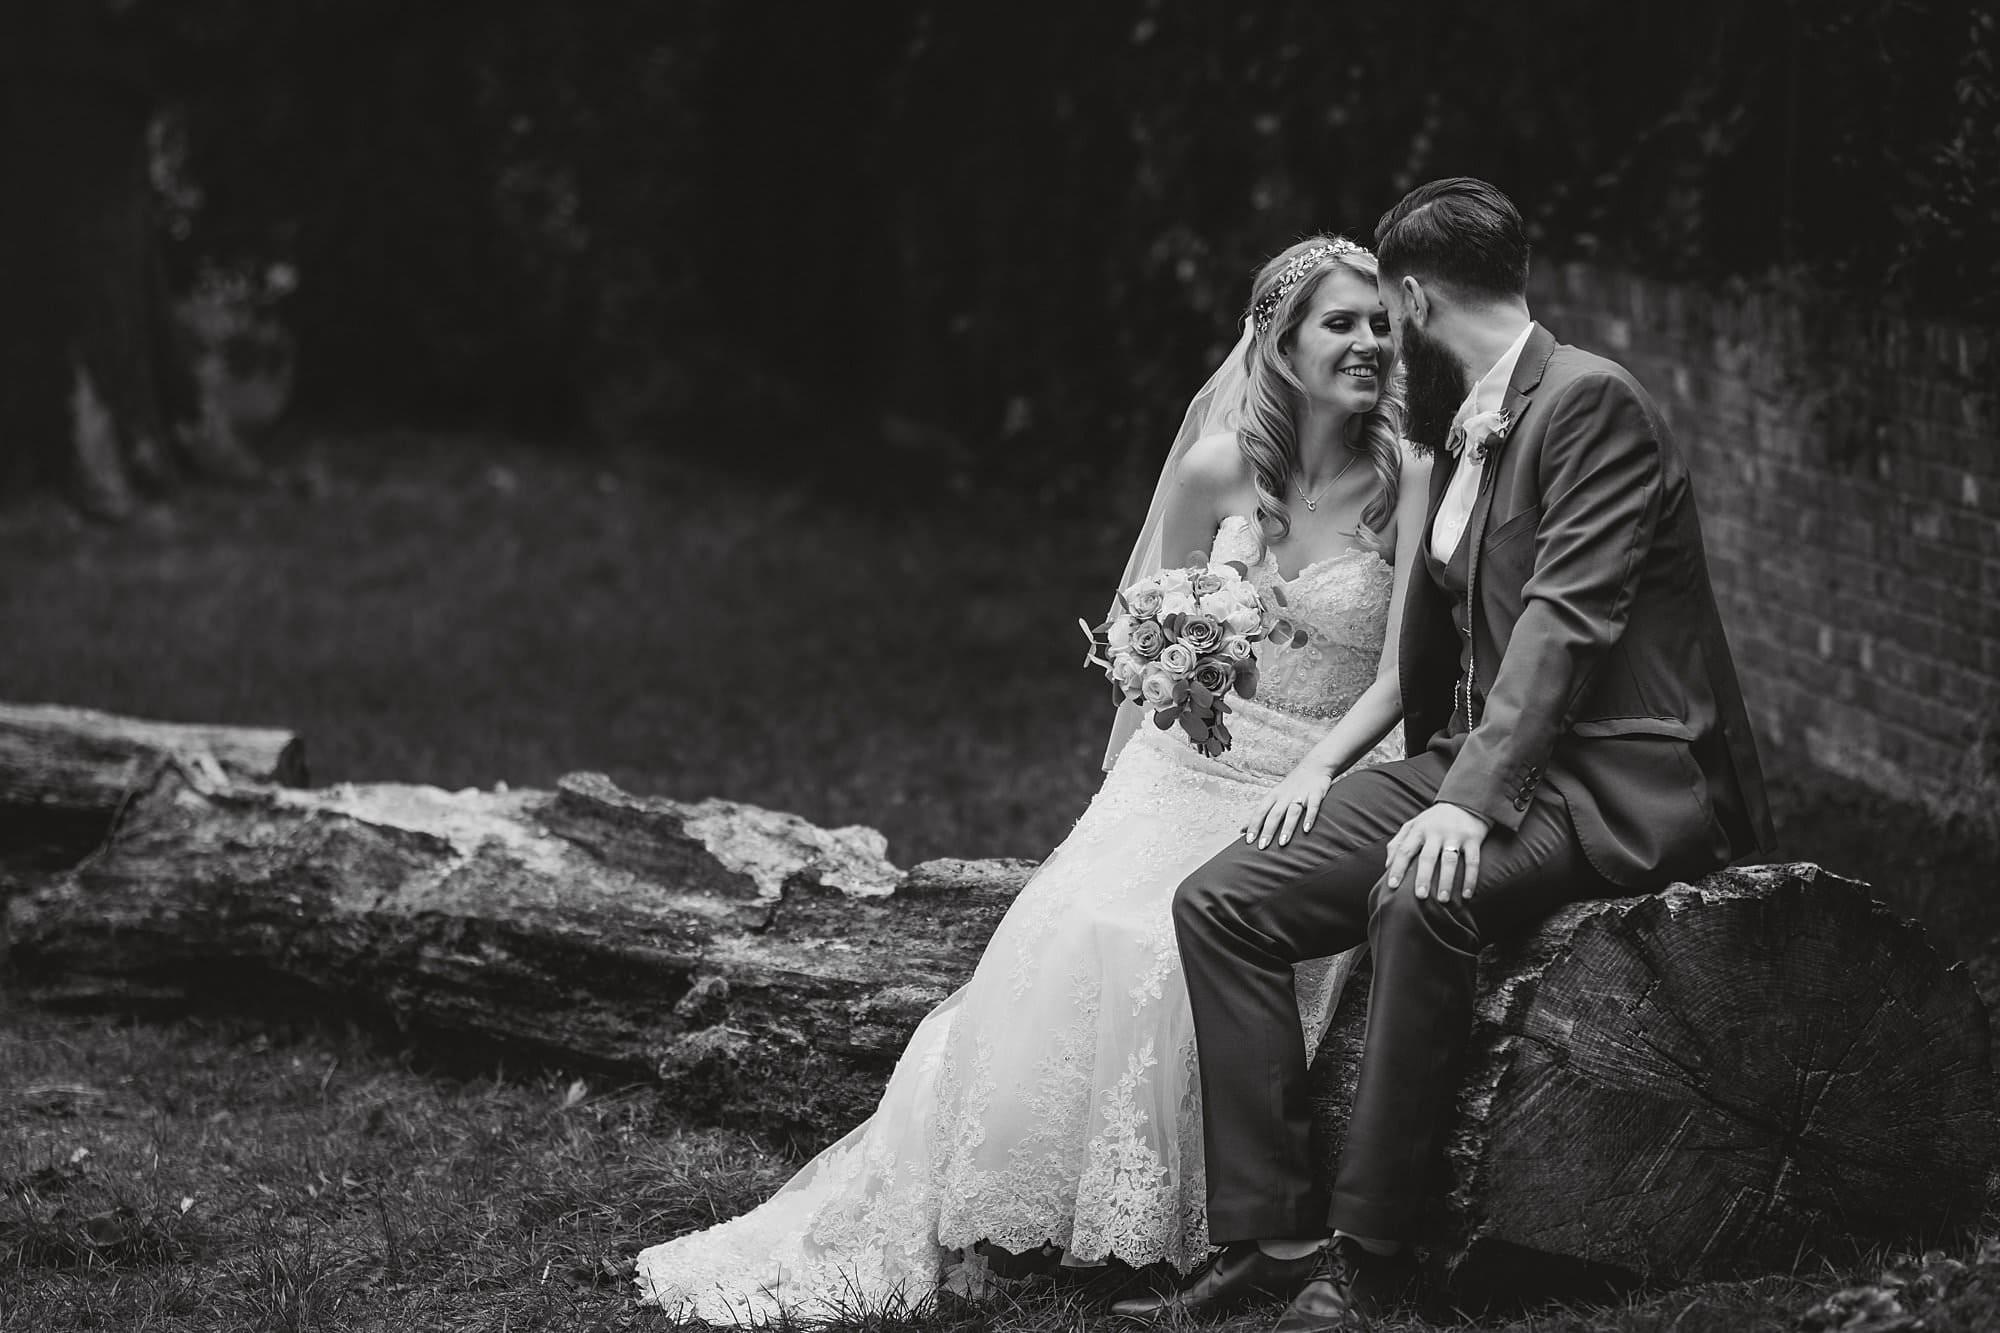 london pub wedding photographer jn 025 - The County Arms Wedding Photographer   Jen & Nick